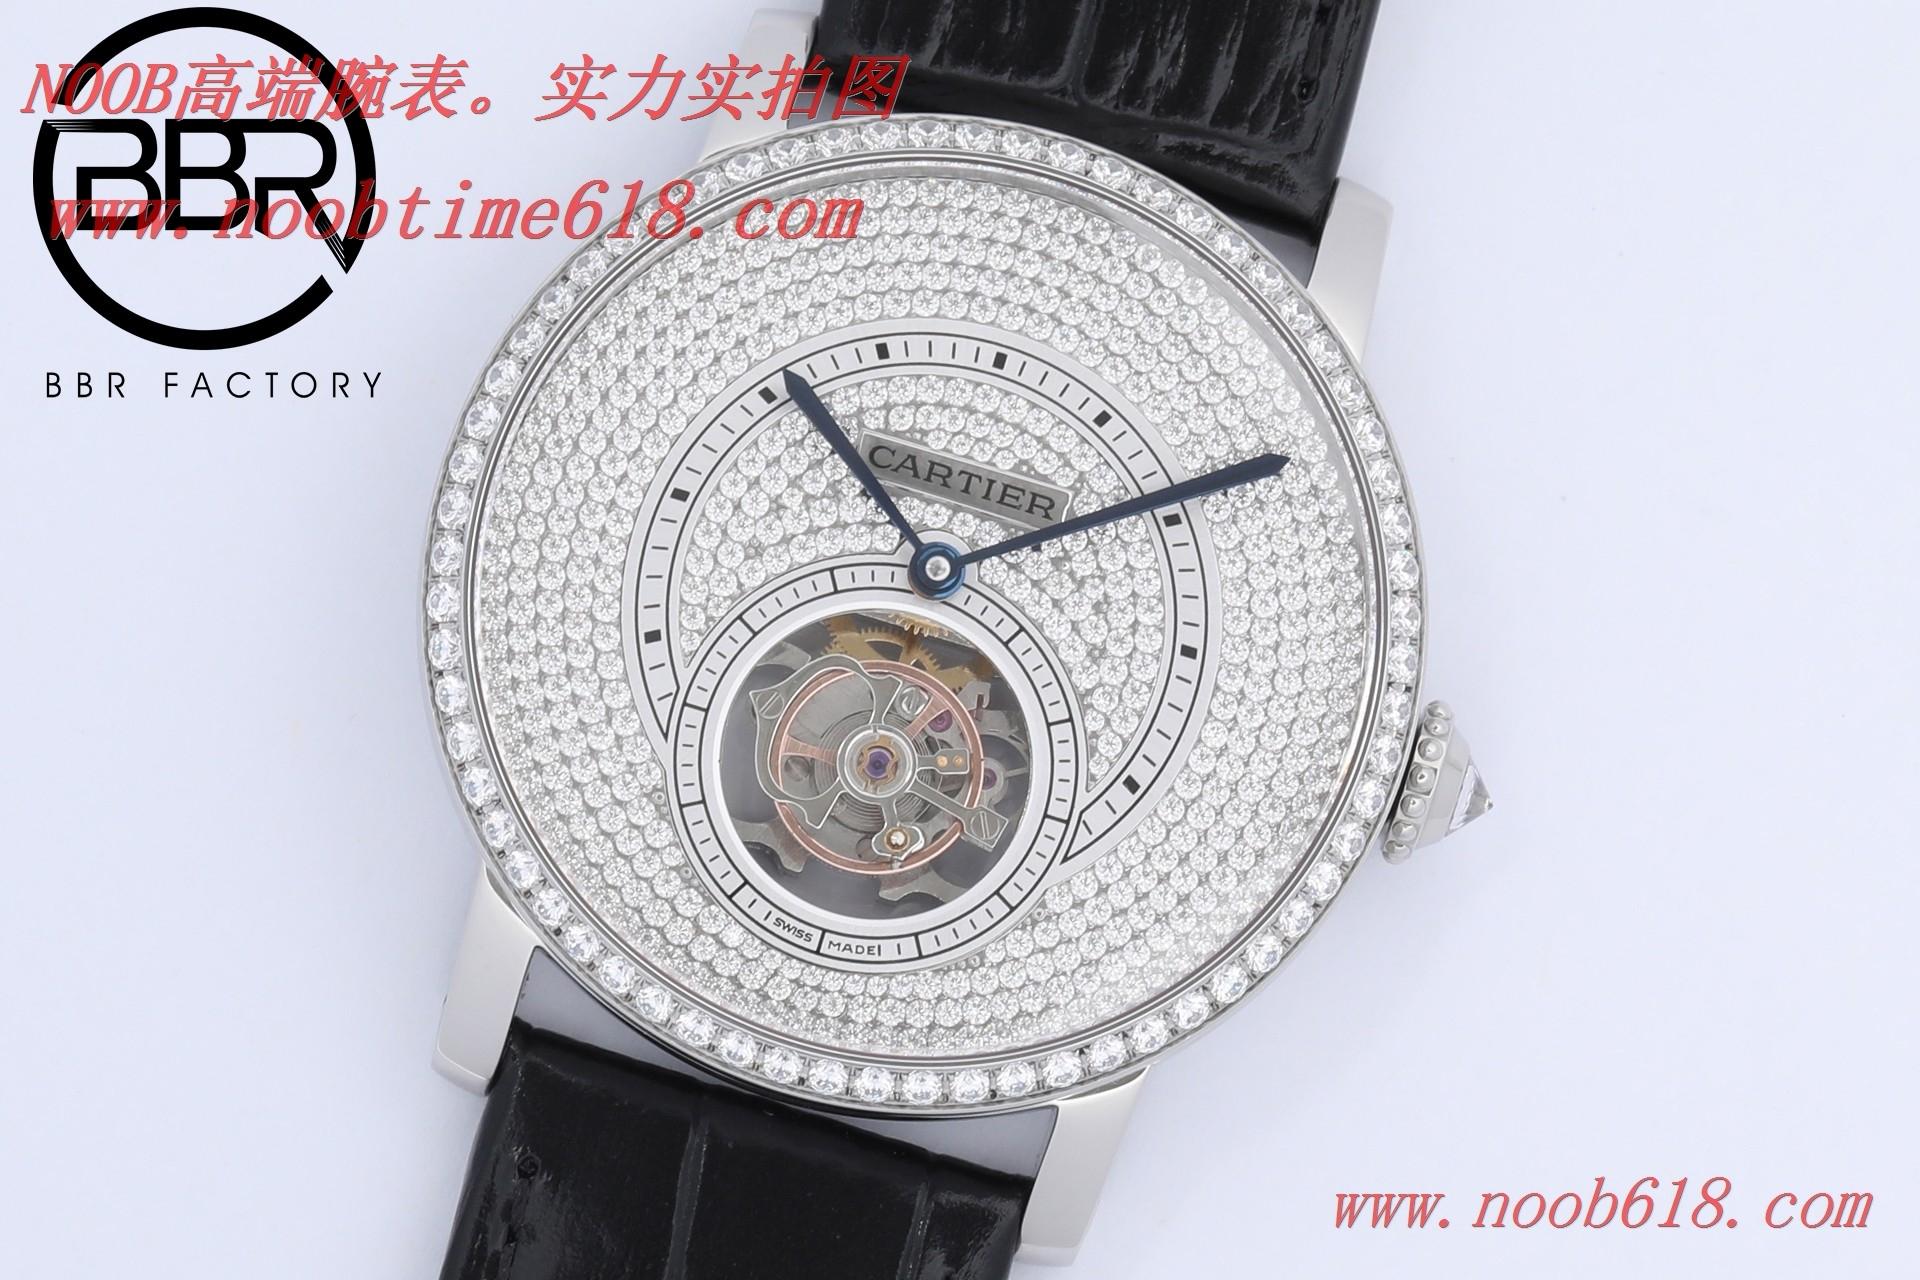 陀飛輪仿錶,精仿手錶,REPLICA WATCH BBR factory卡地亞陀飛輪ROTONDE DE CARTER 系列型號:HPI00593,N廠手錶